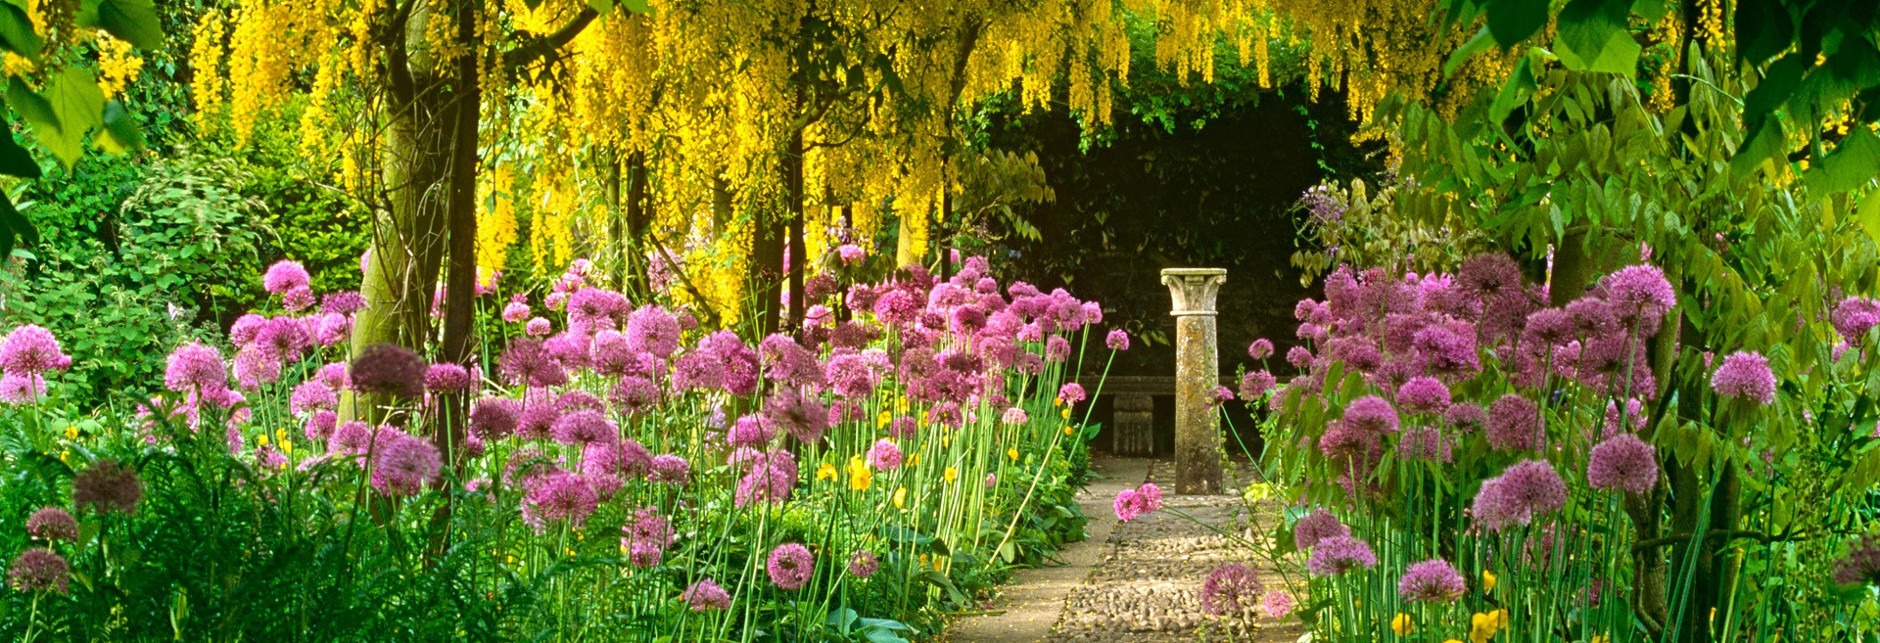 garden-wallpaper-1.jpg